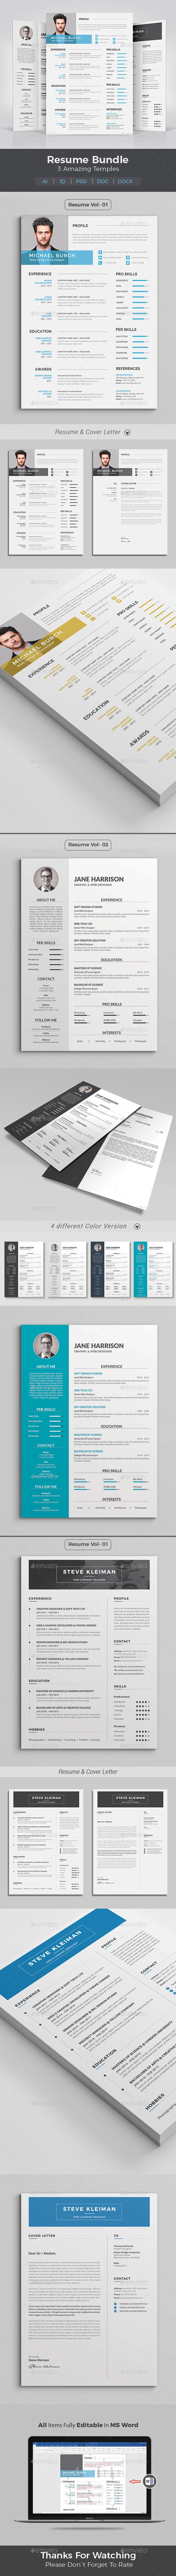 GraphicRiver Resume Word Bundle 20630634